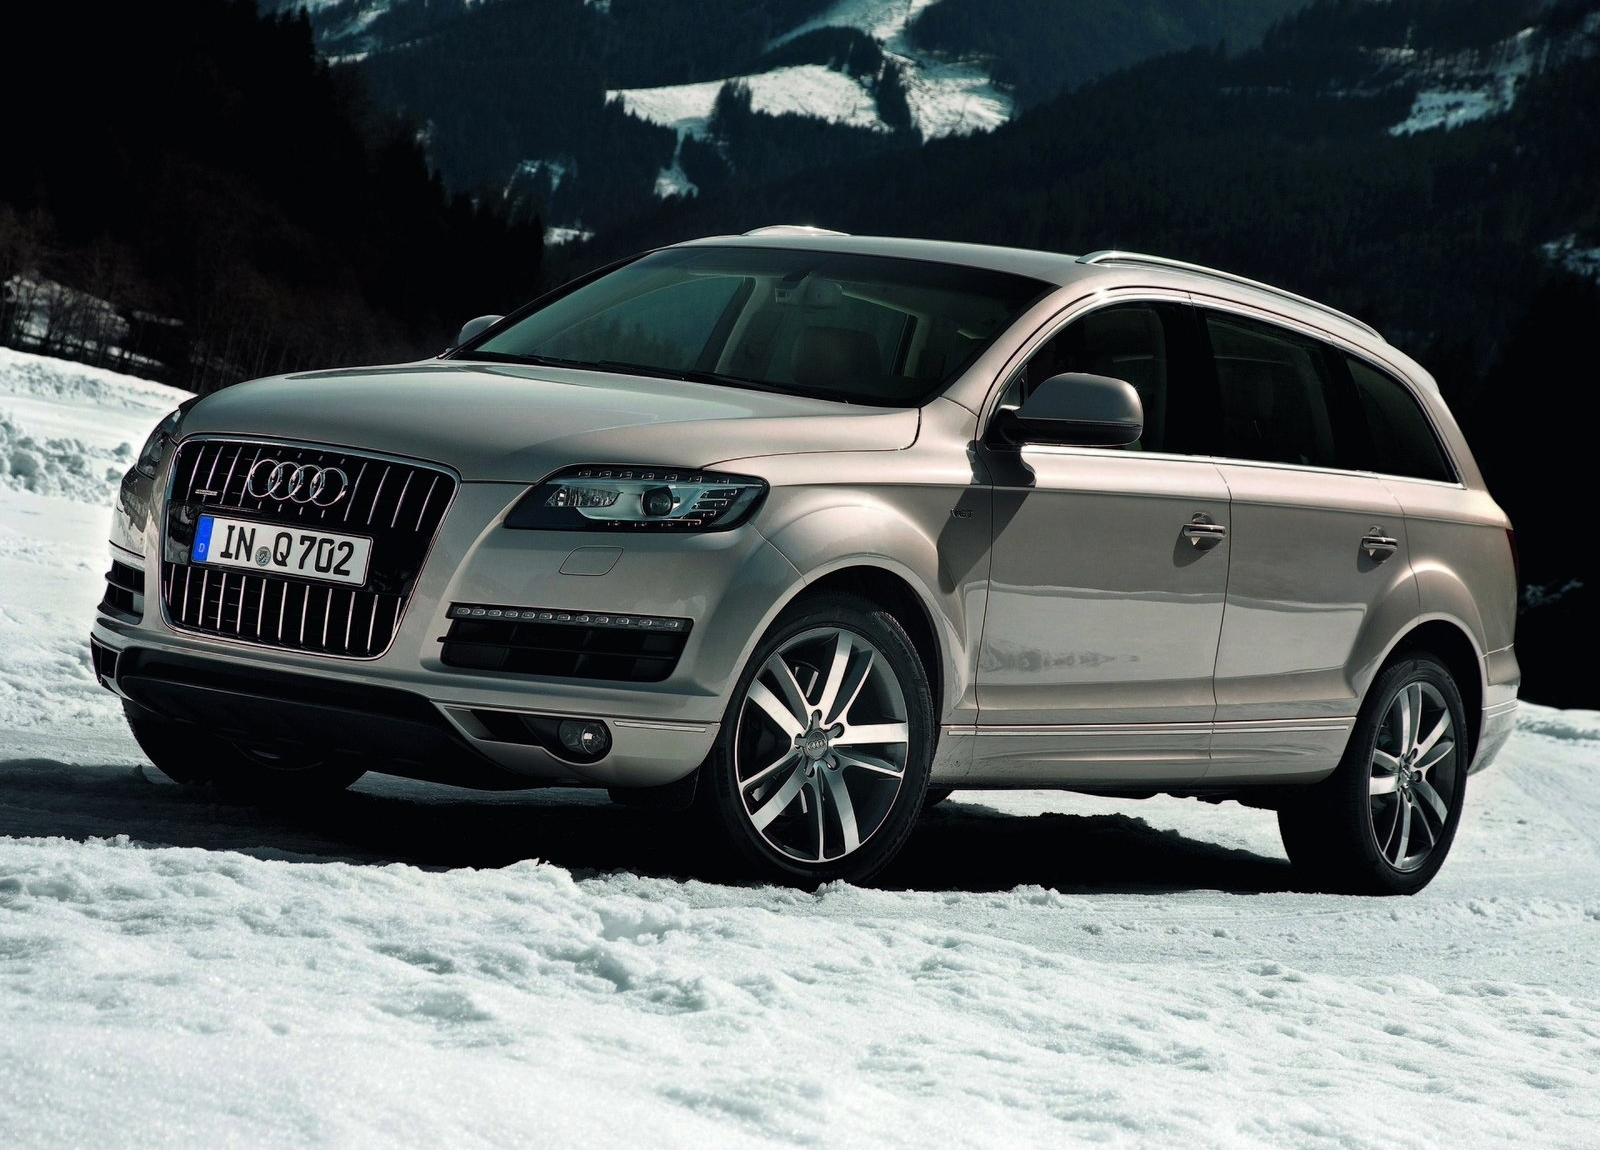 http://2.bp.blogspot.com/-kHiWQ1ZbuB4/T5eZtfd5C-I/AAAAAAAAFtQ/5kgXejyFoWs/s1600/Audi-2011_Q7_wallpaper-1600x1200_0003.jpg